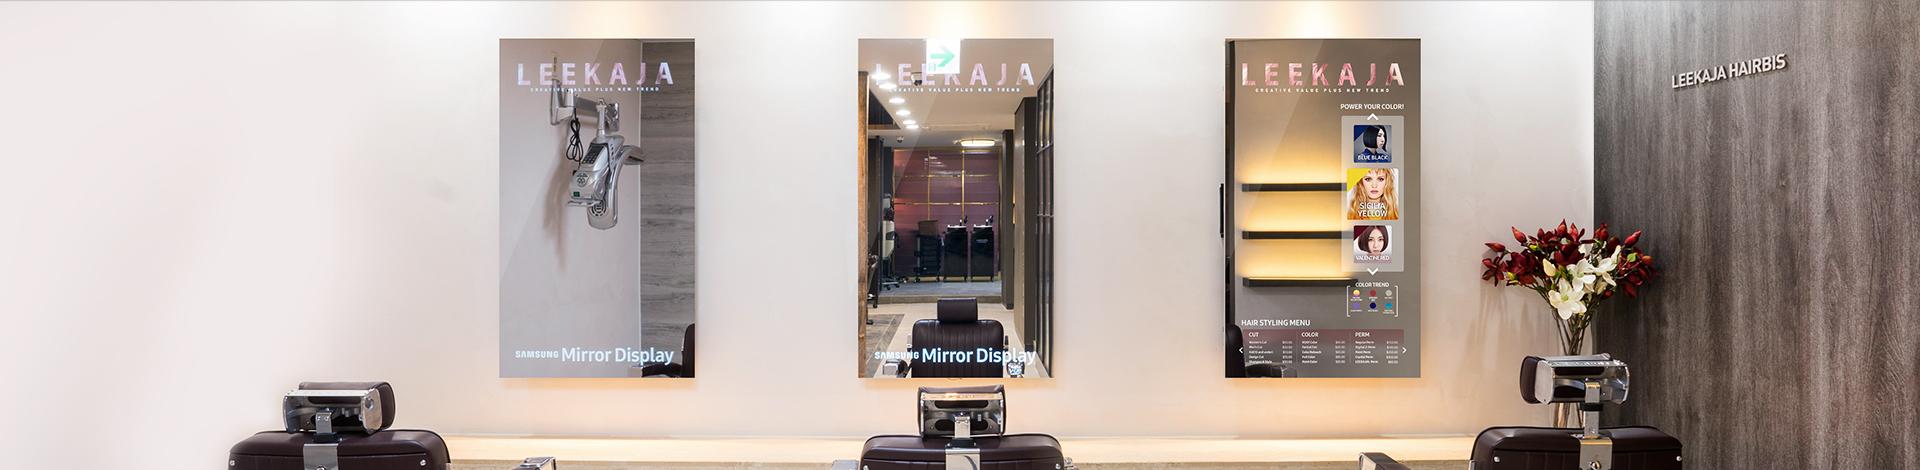 Amplasarea solutiei de mirror display intr-o zona comerciala